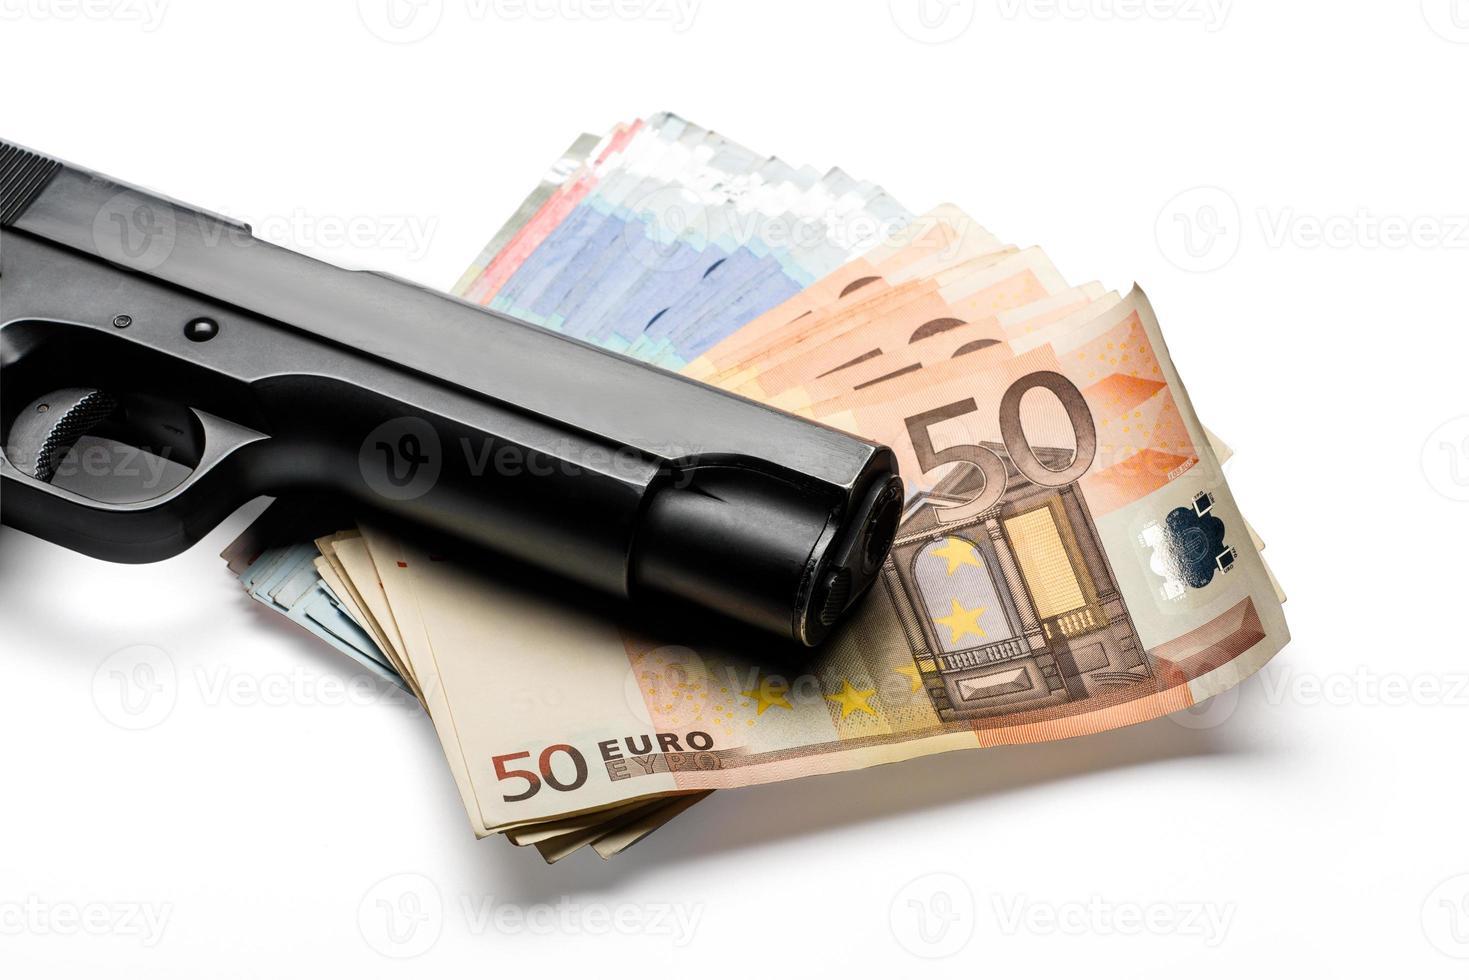 Bunch of euro banknotes with a gun photo